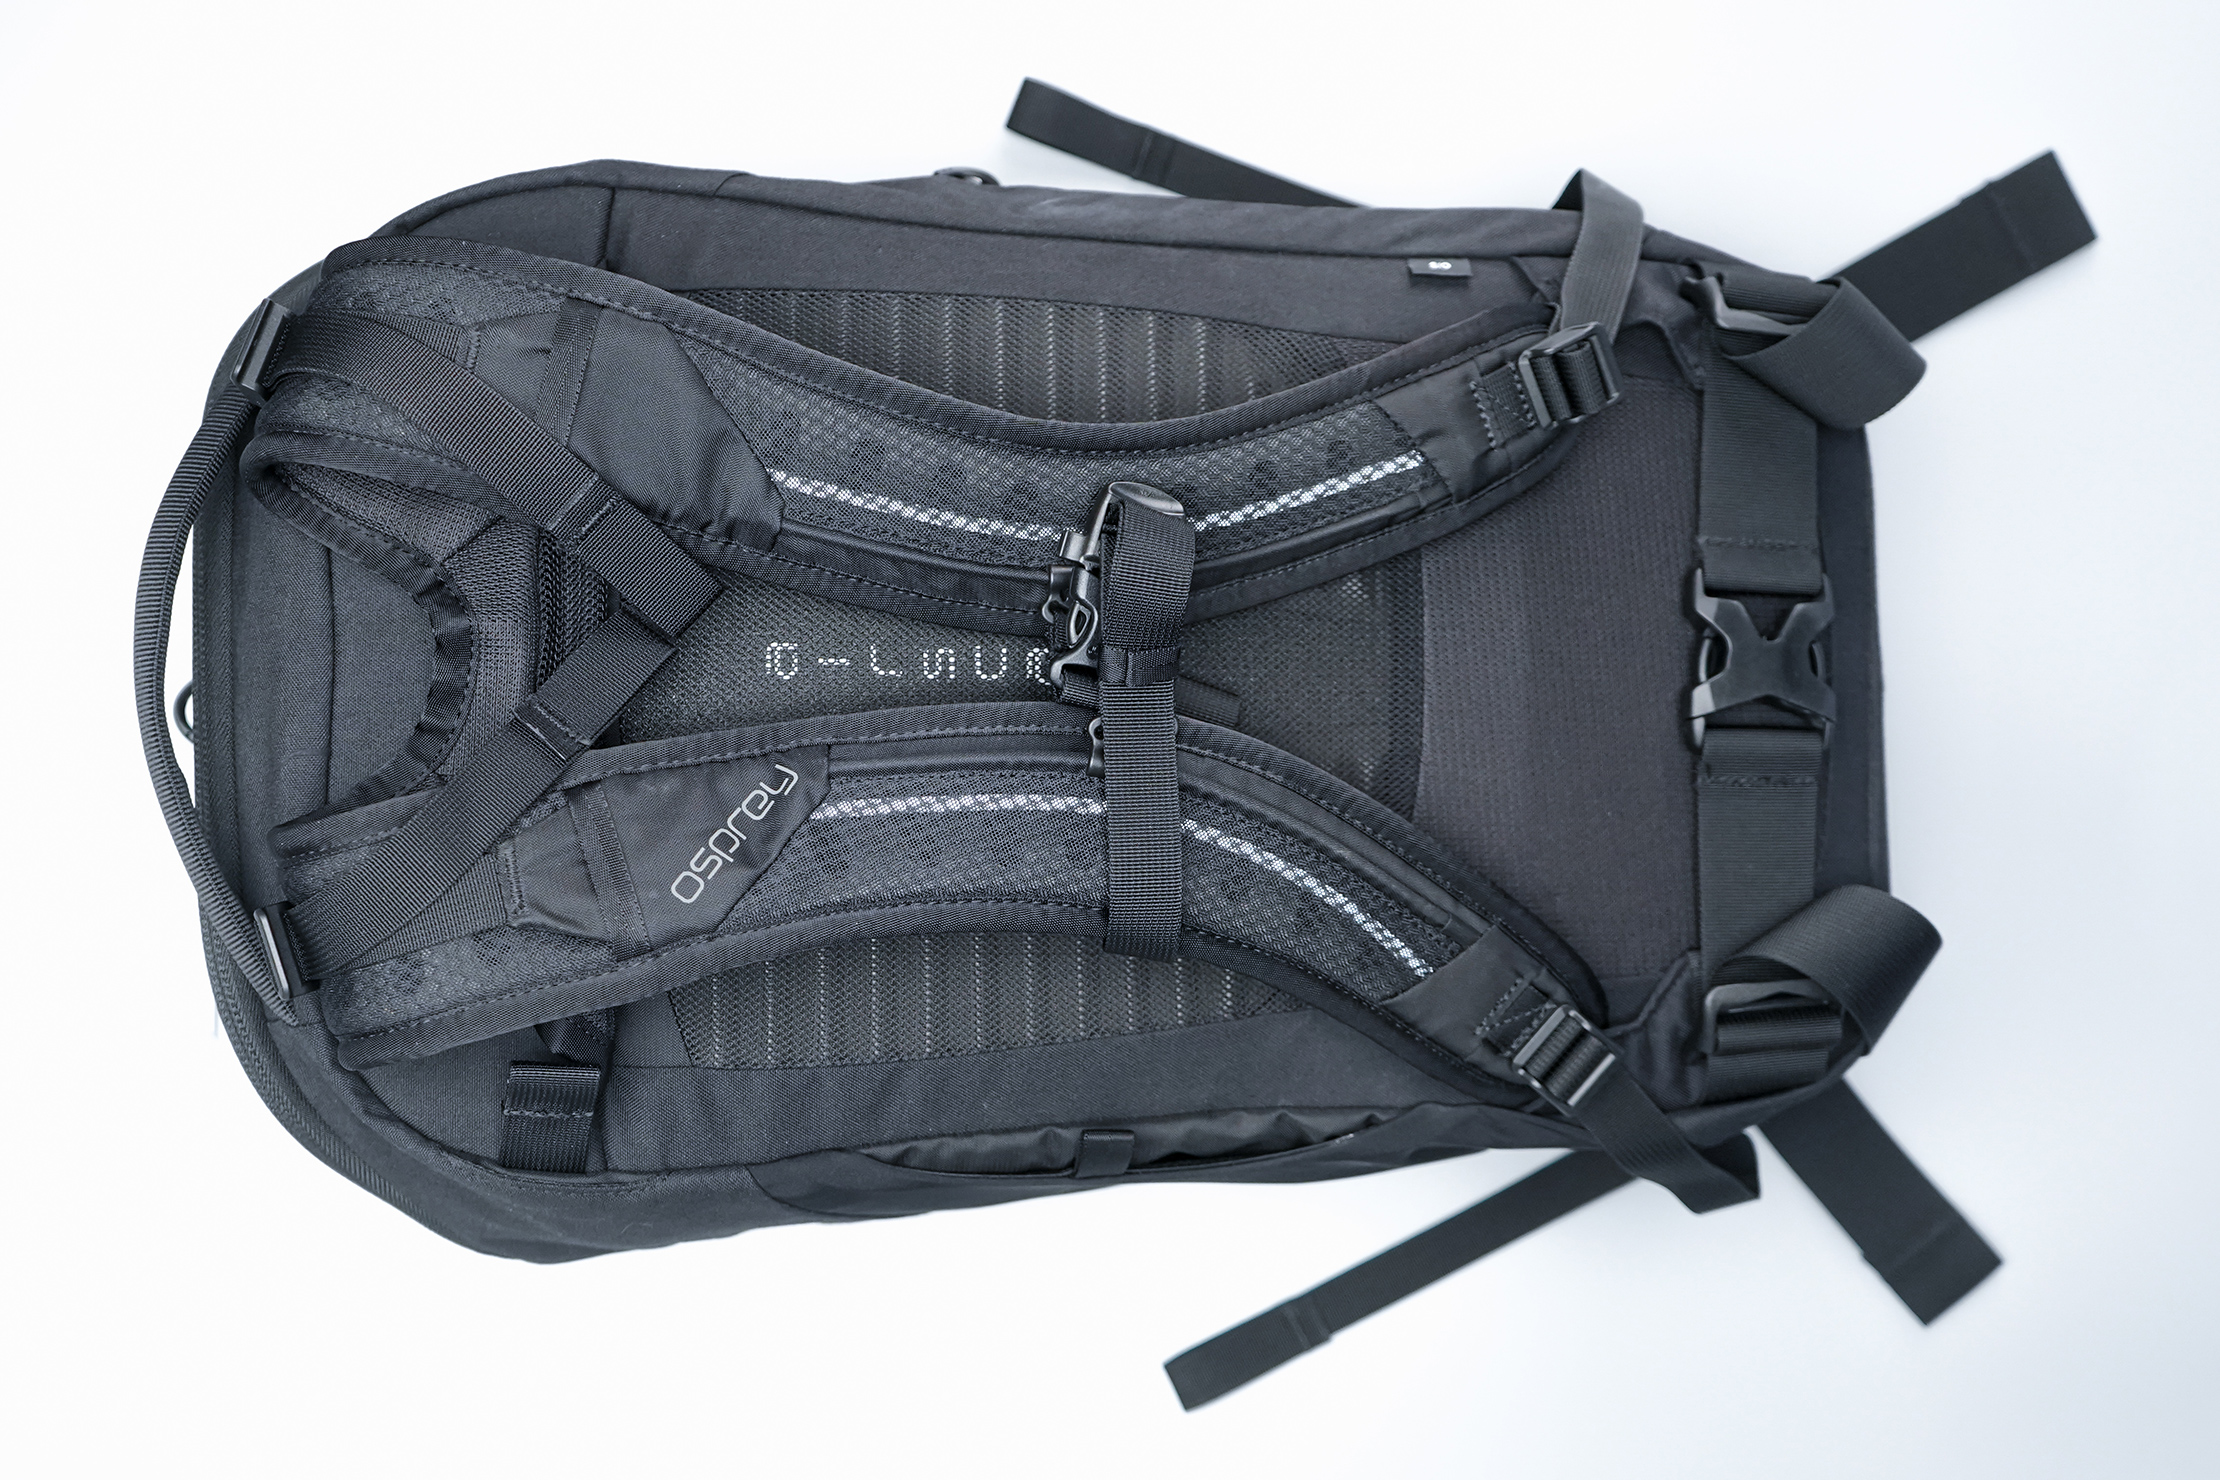 Osprey METRON Harness System